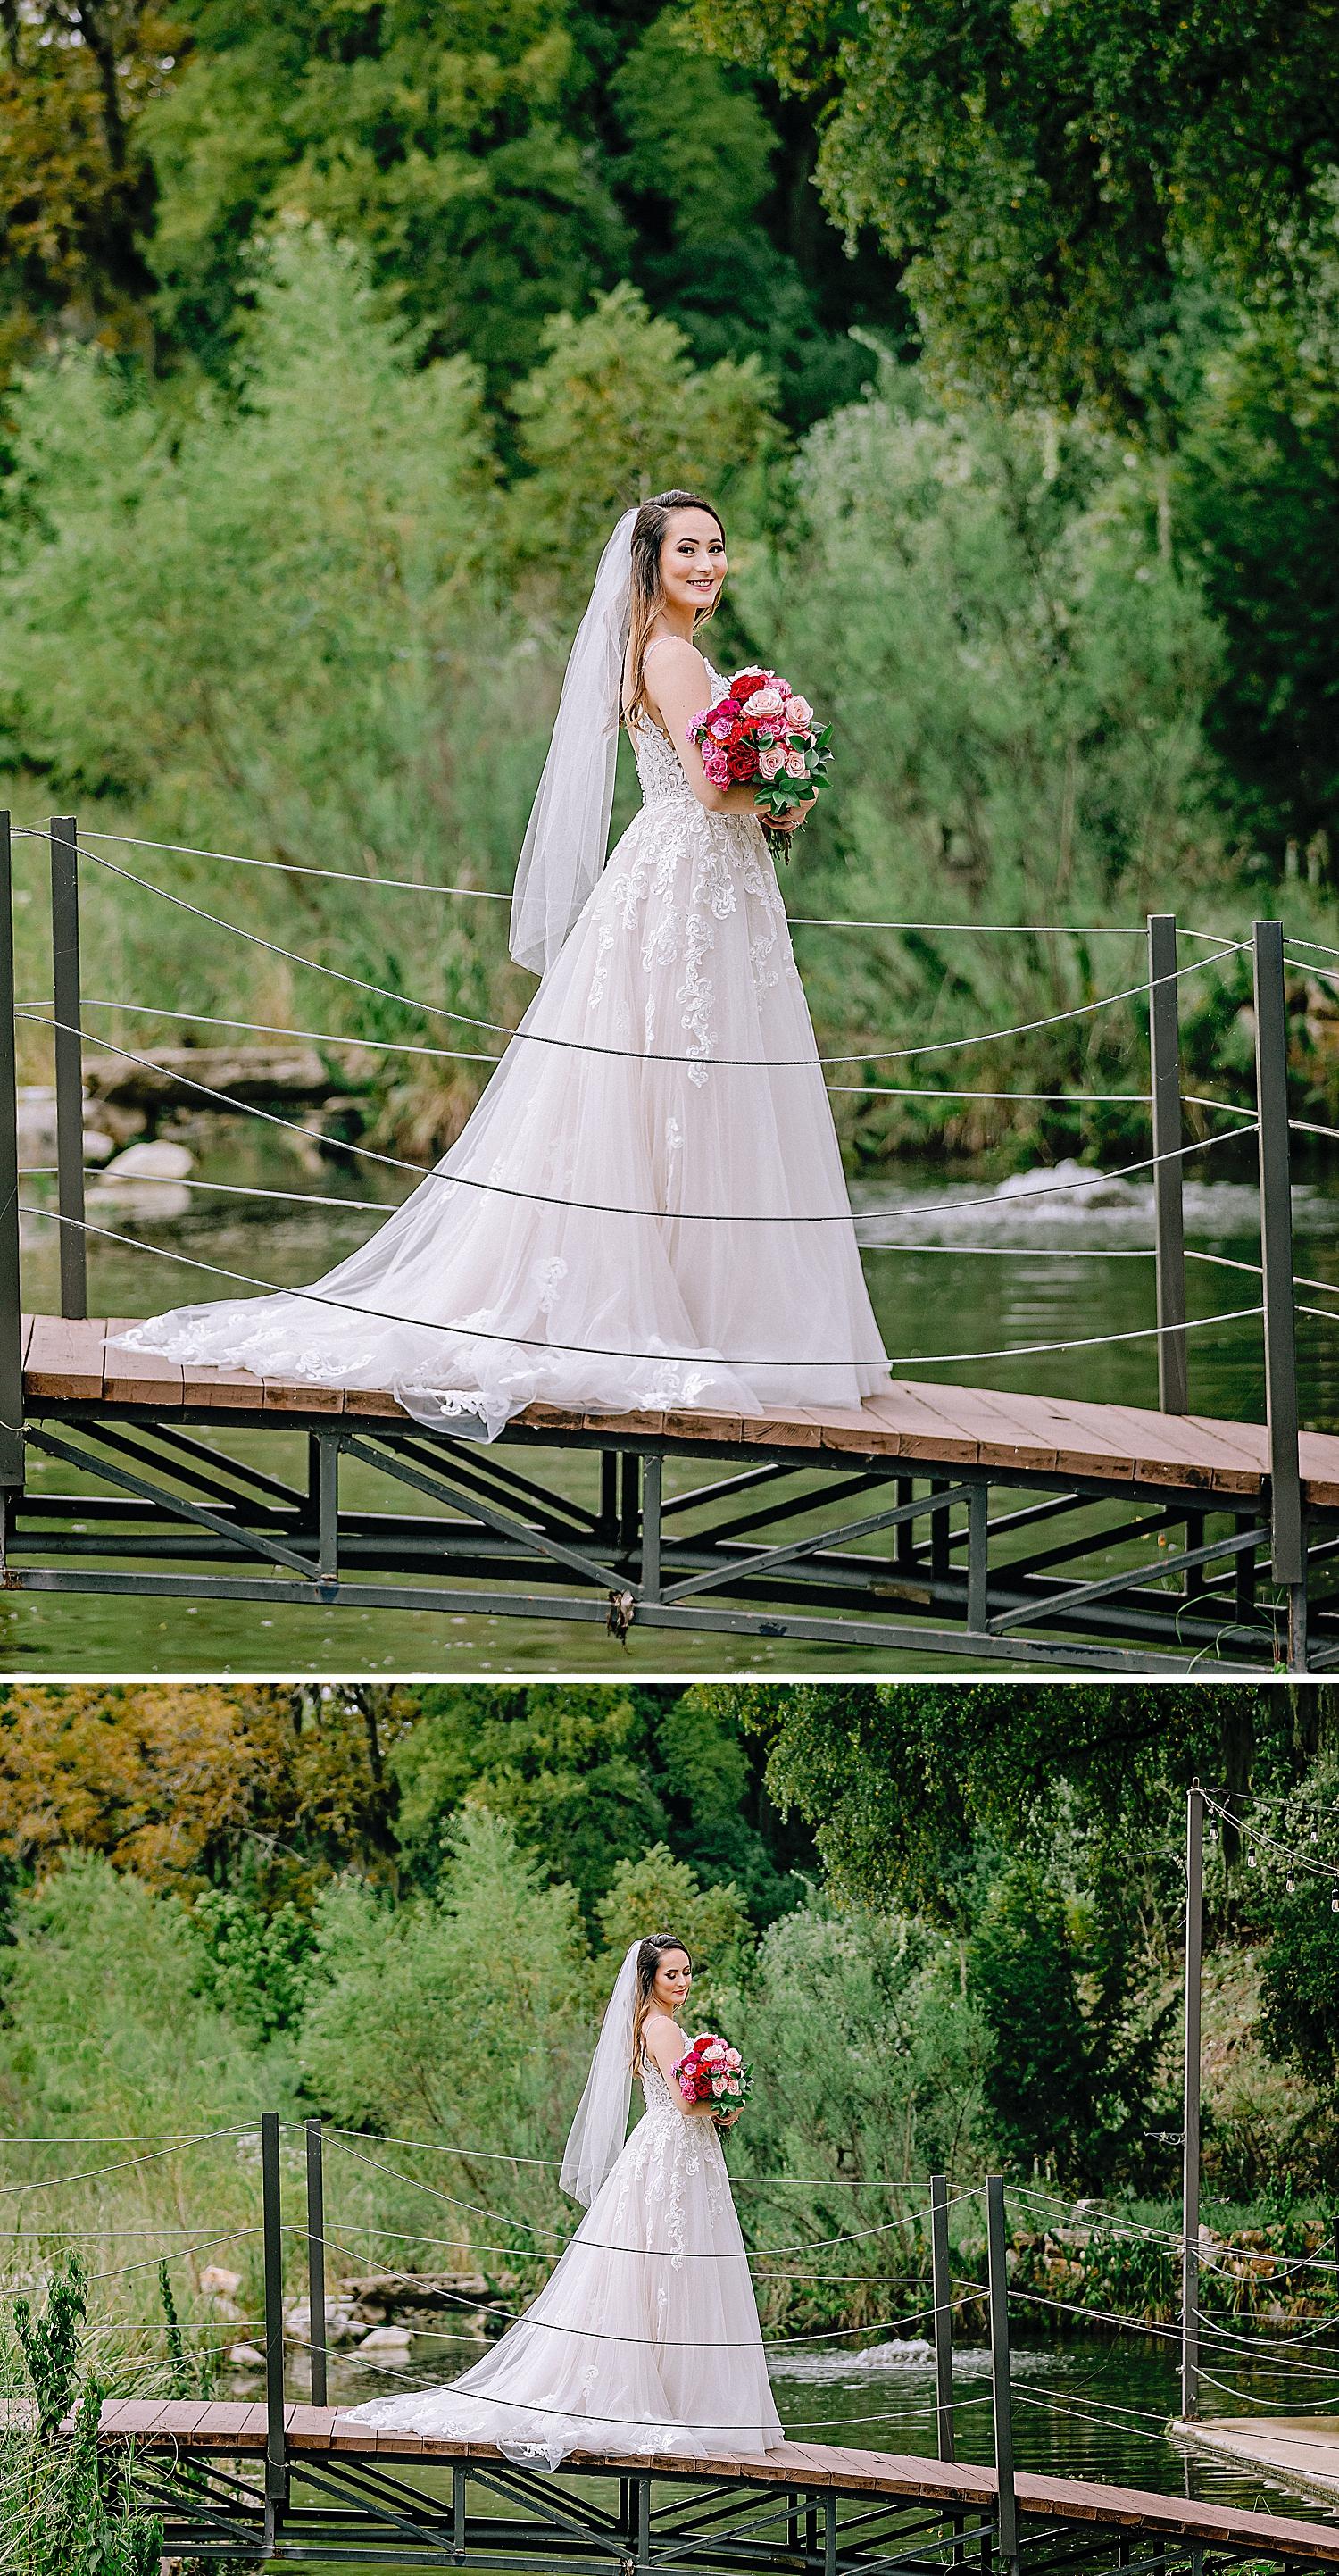 Carly-Barton-Photography-Bridal-Photos-Remis-Ridge-Hidden-Falls-New-Braunfels-Texas-Bride_0026.jpg